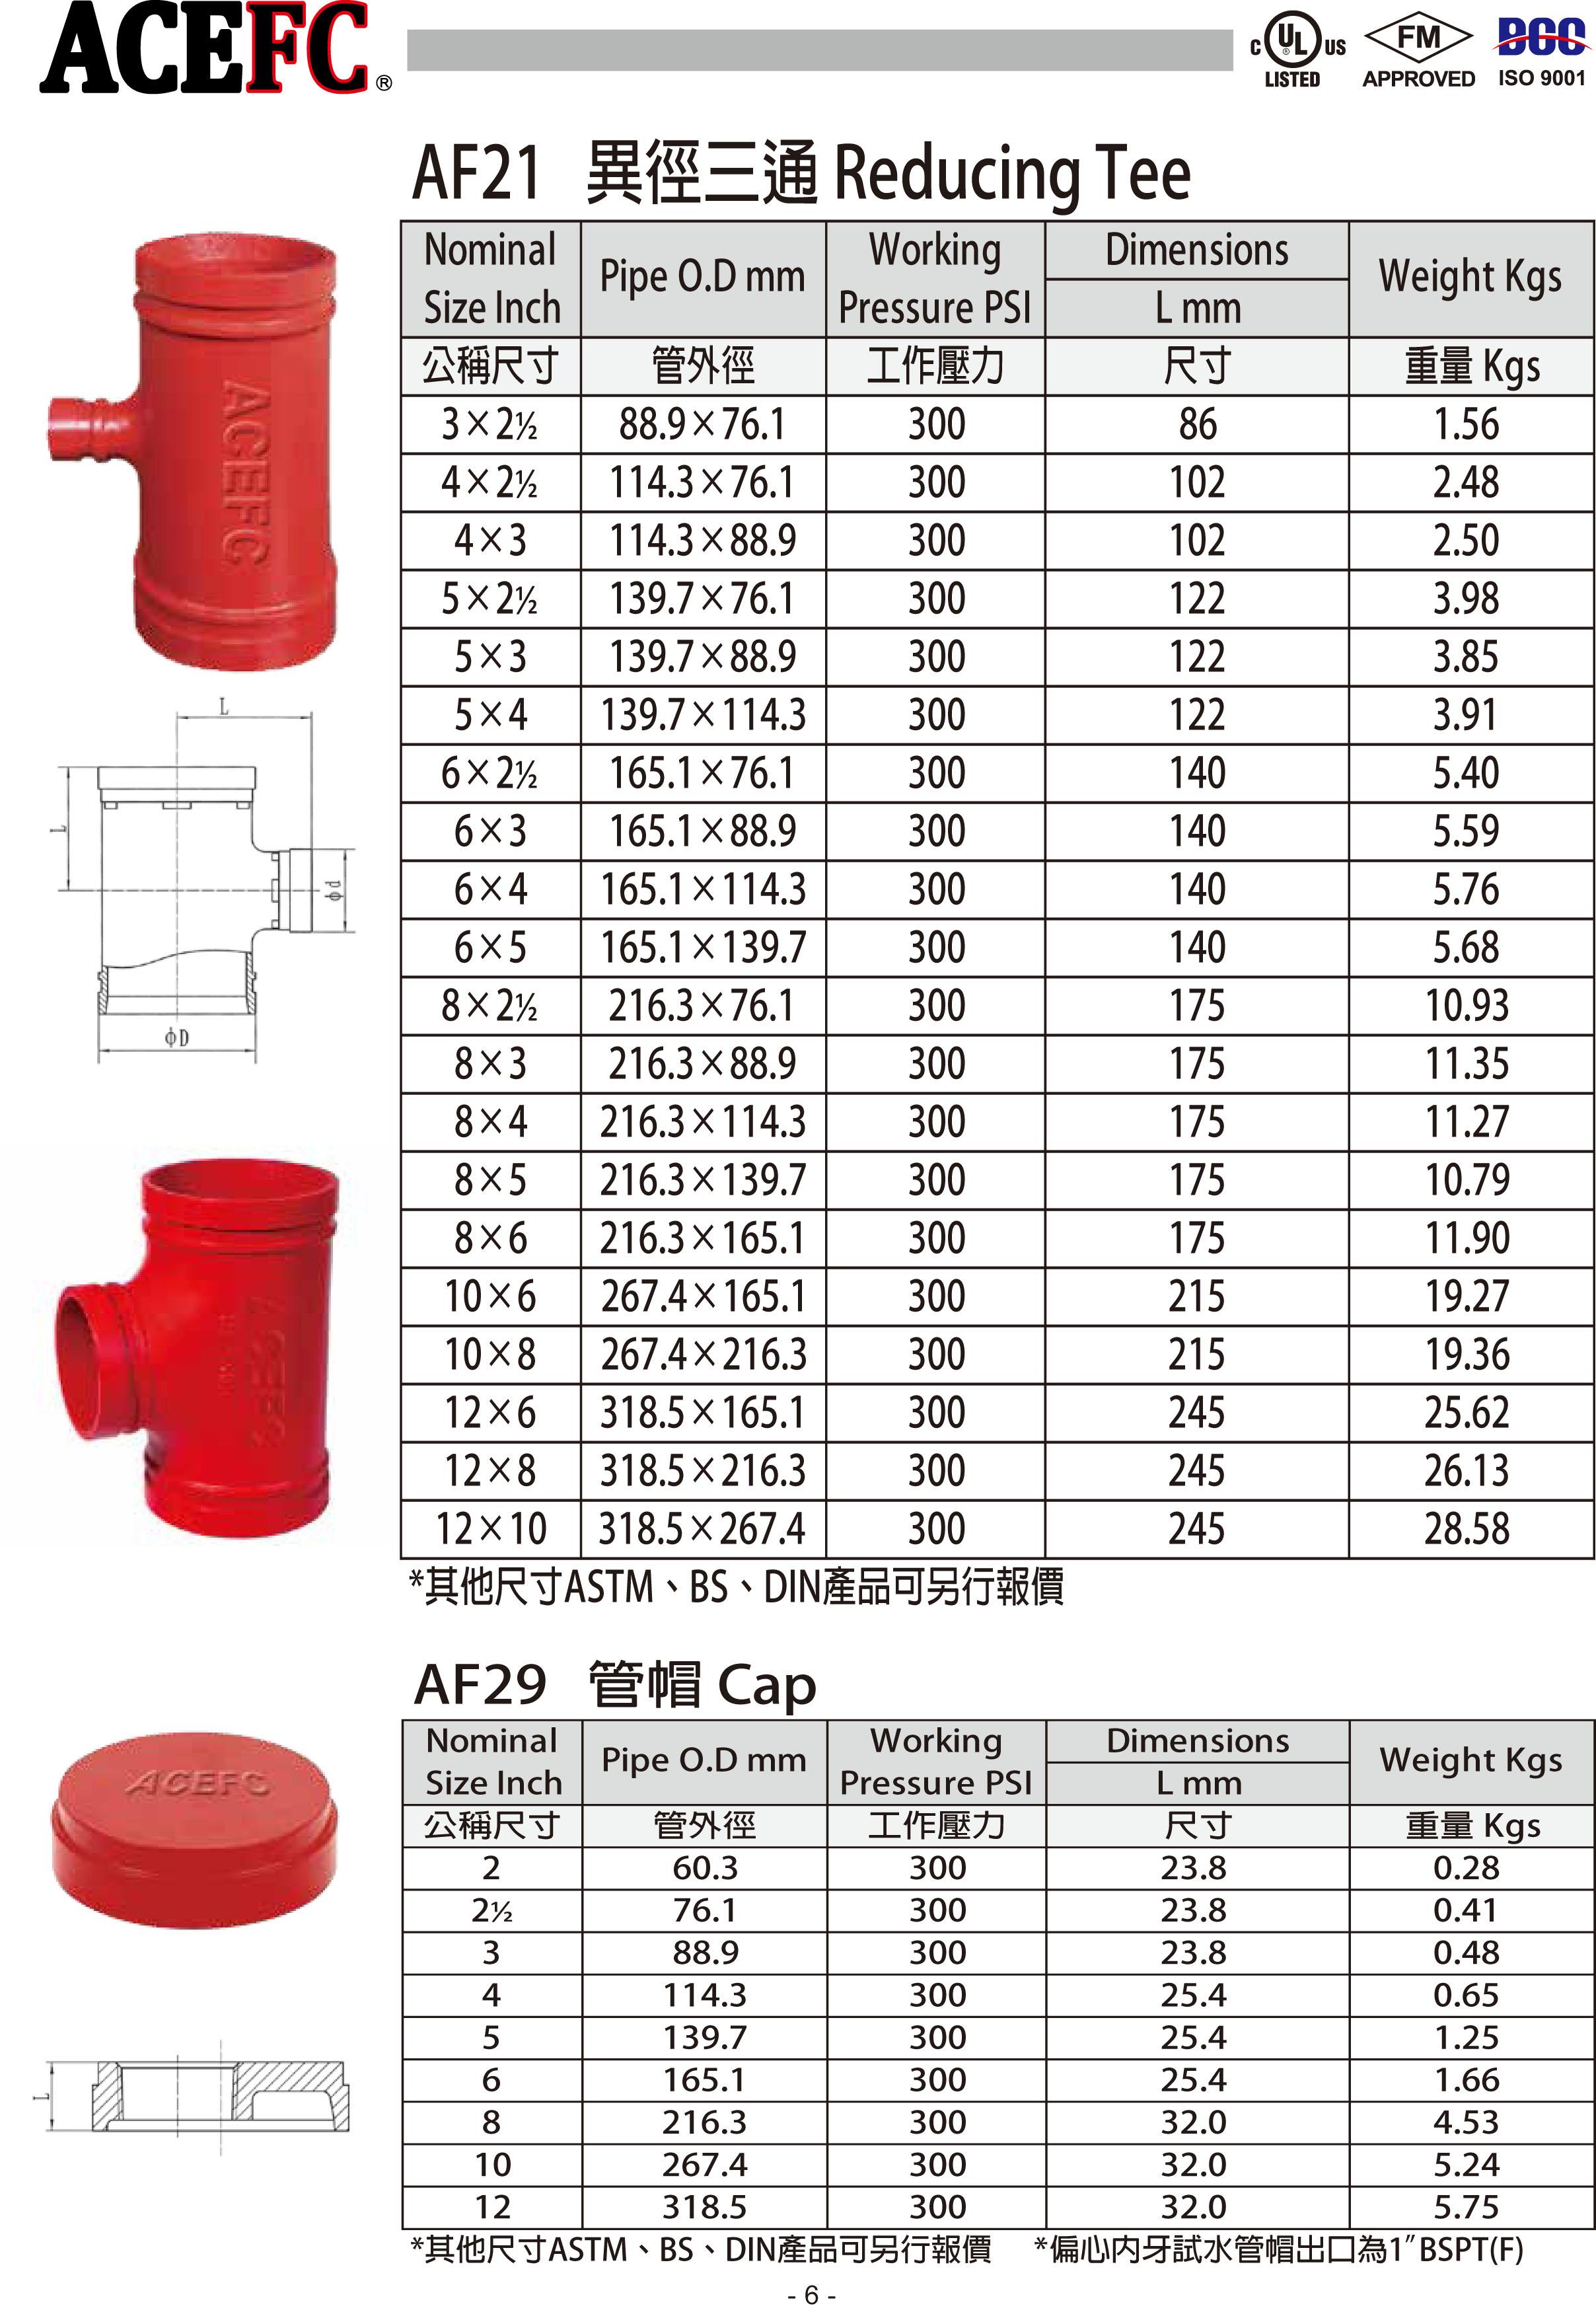 ACEFC王牌溝槽式機械接頭-高極管件-9.jpg